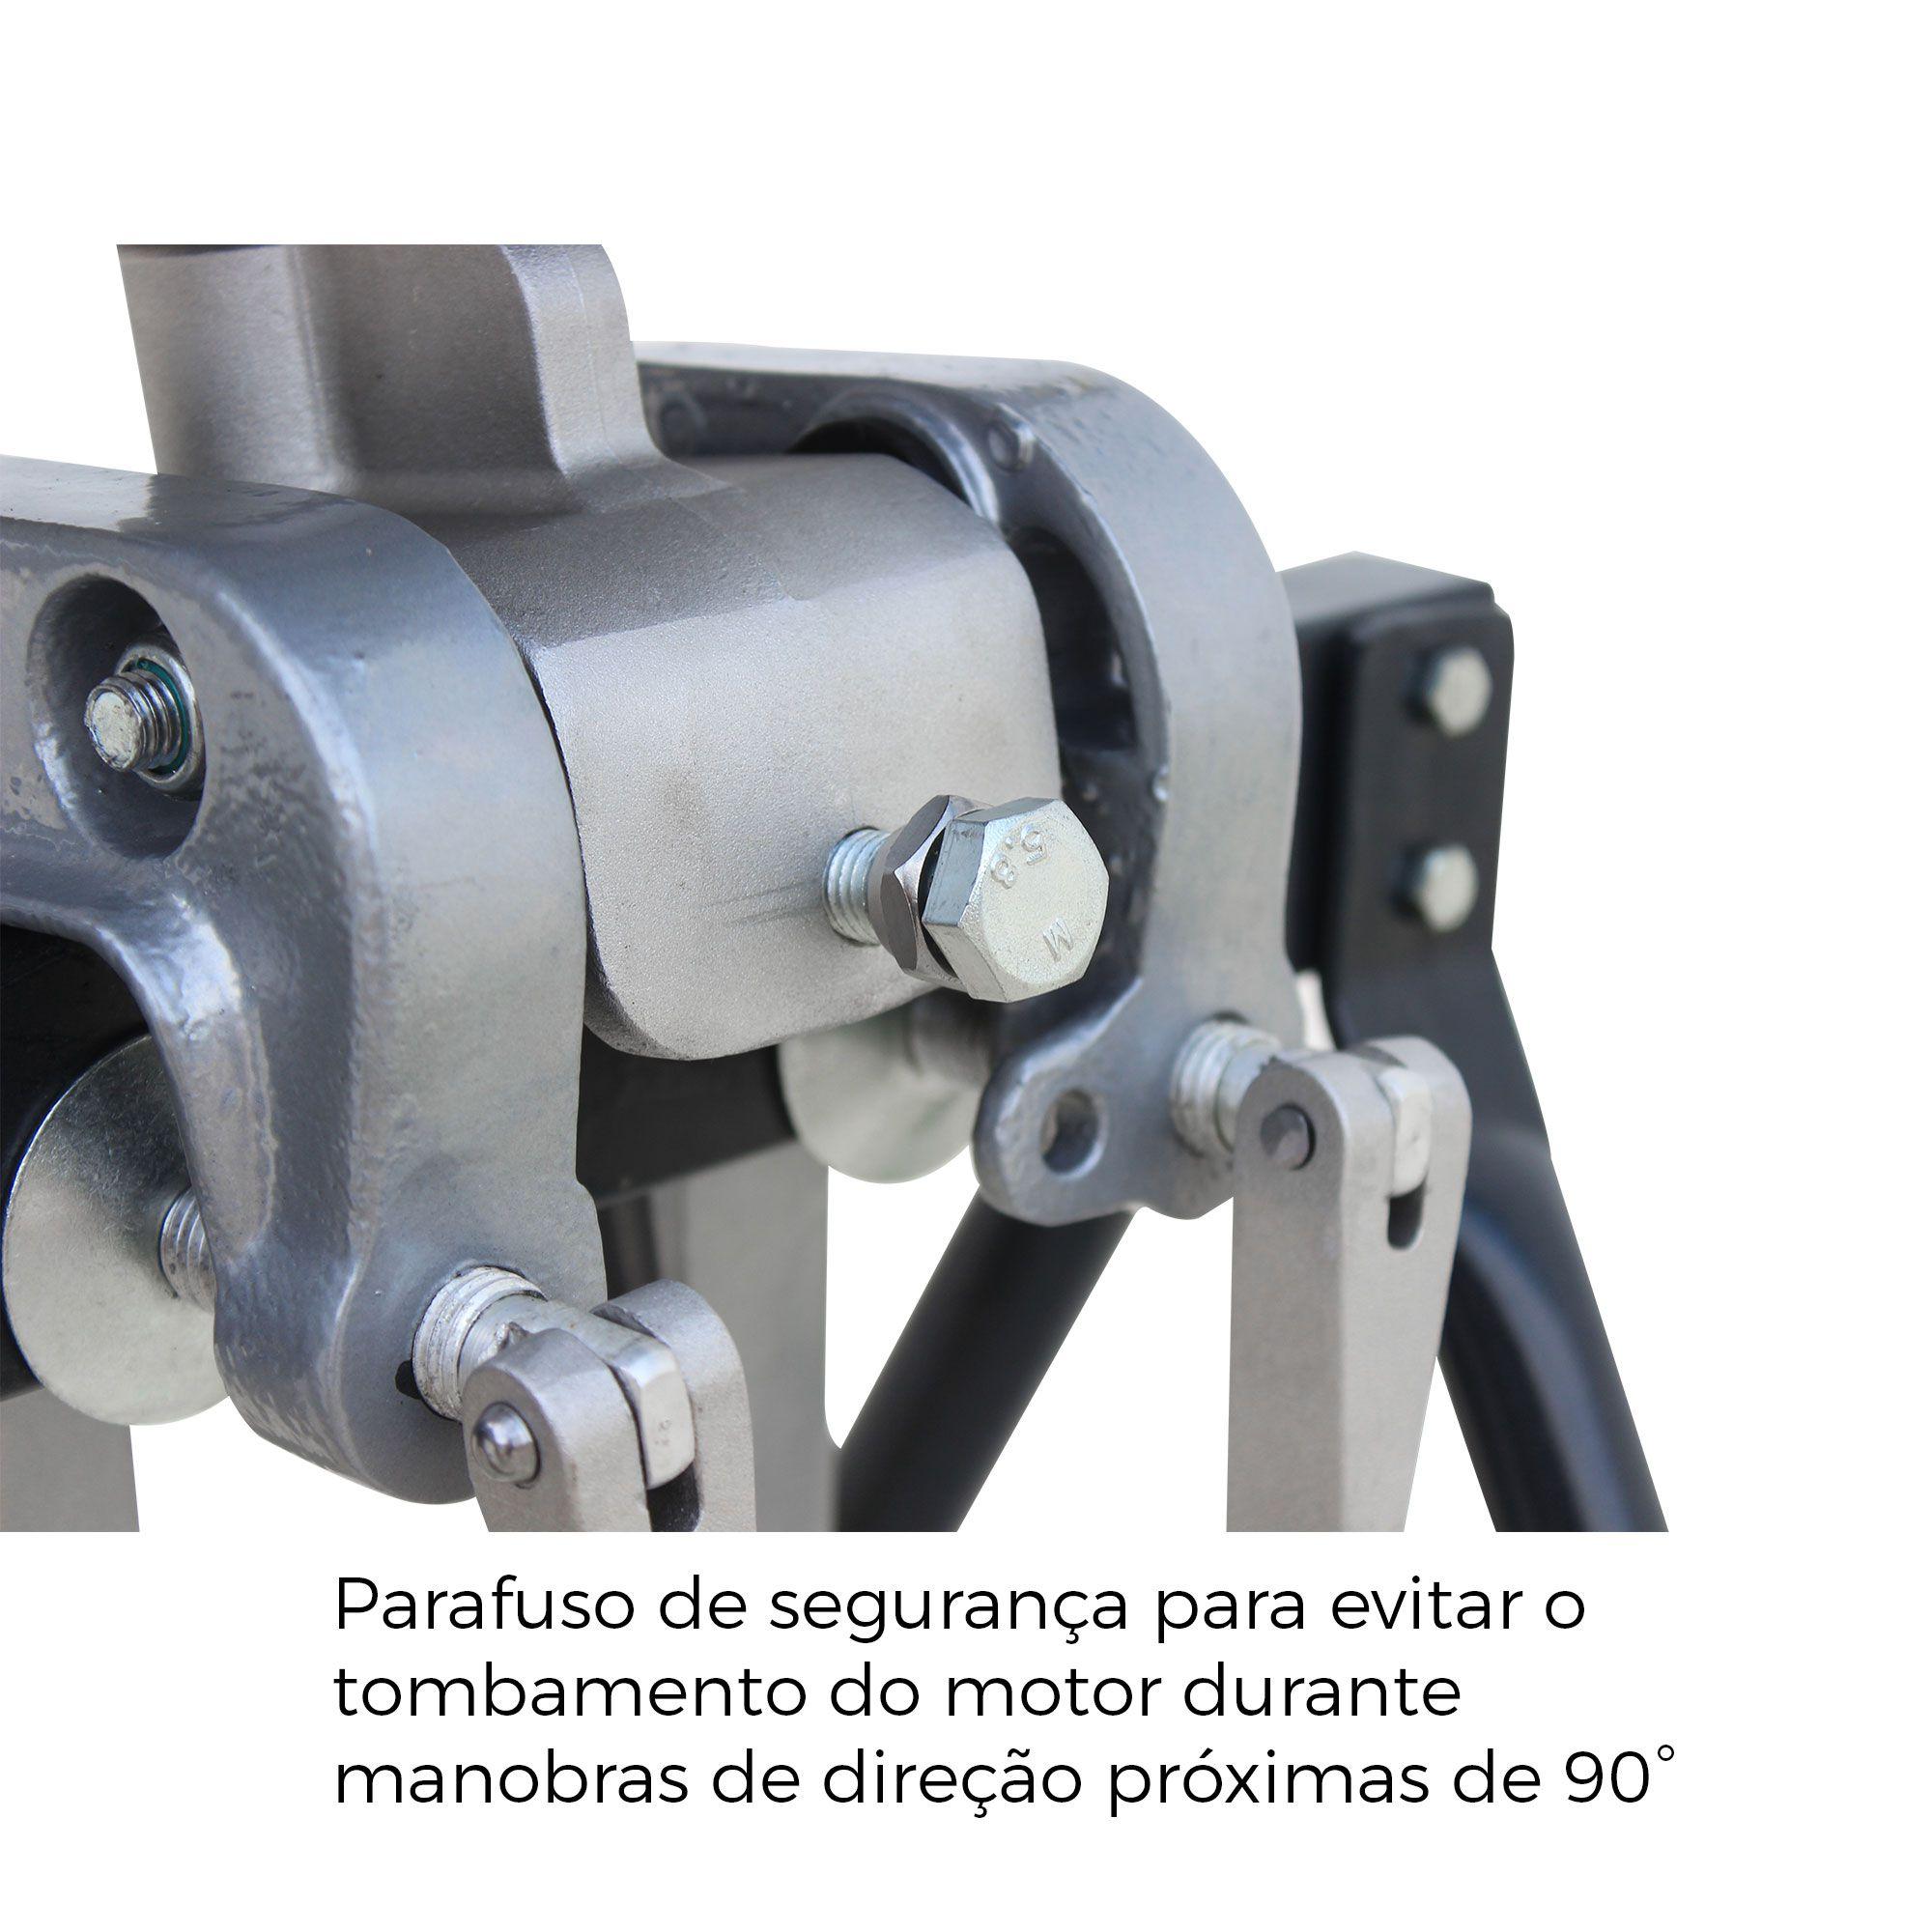 Rabeta Master Plus Pantaneiro 1,70 metros para motores 5,5/6,5 e 7HP (Sem motor)